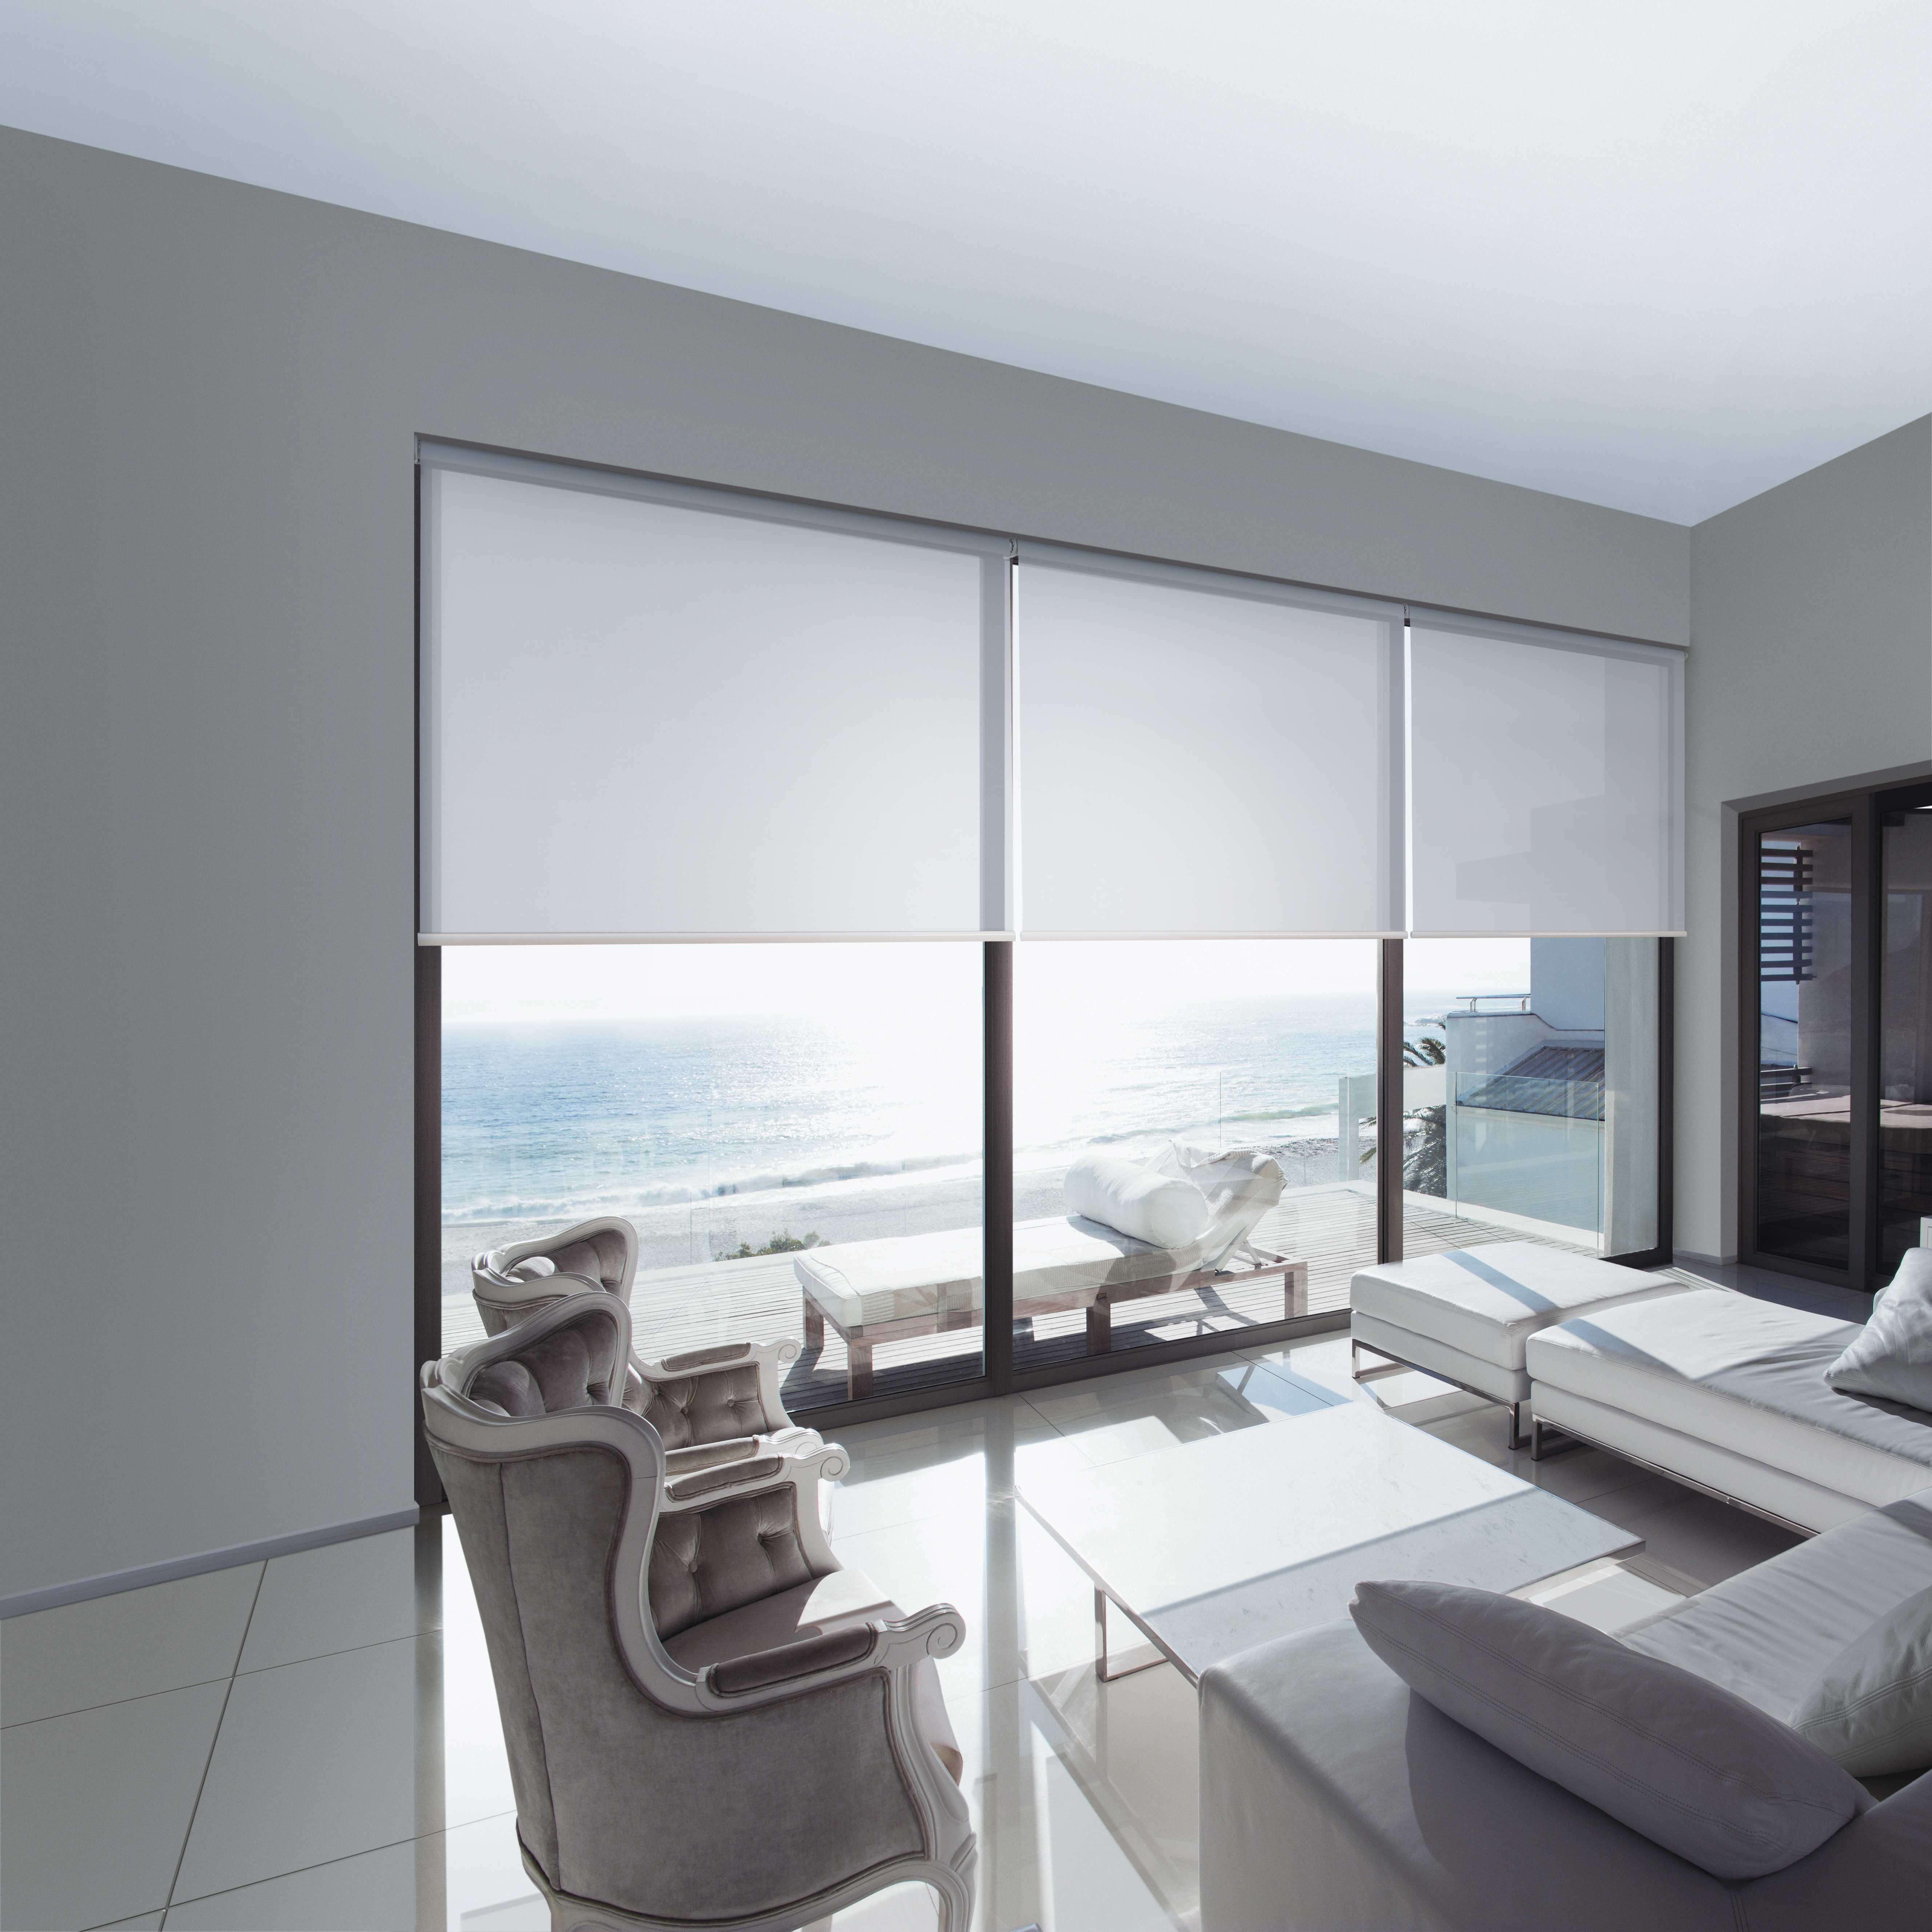 Dollar Curtains & Blinds Sunscreen Linked Roller Blinds